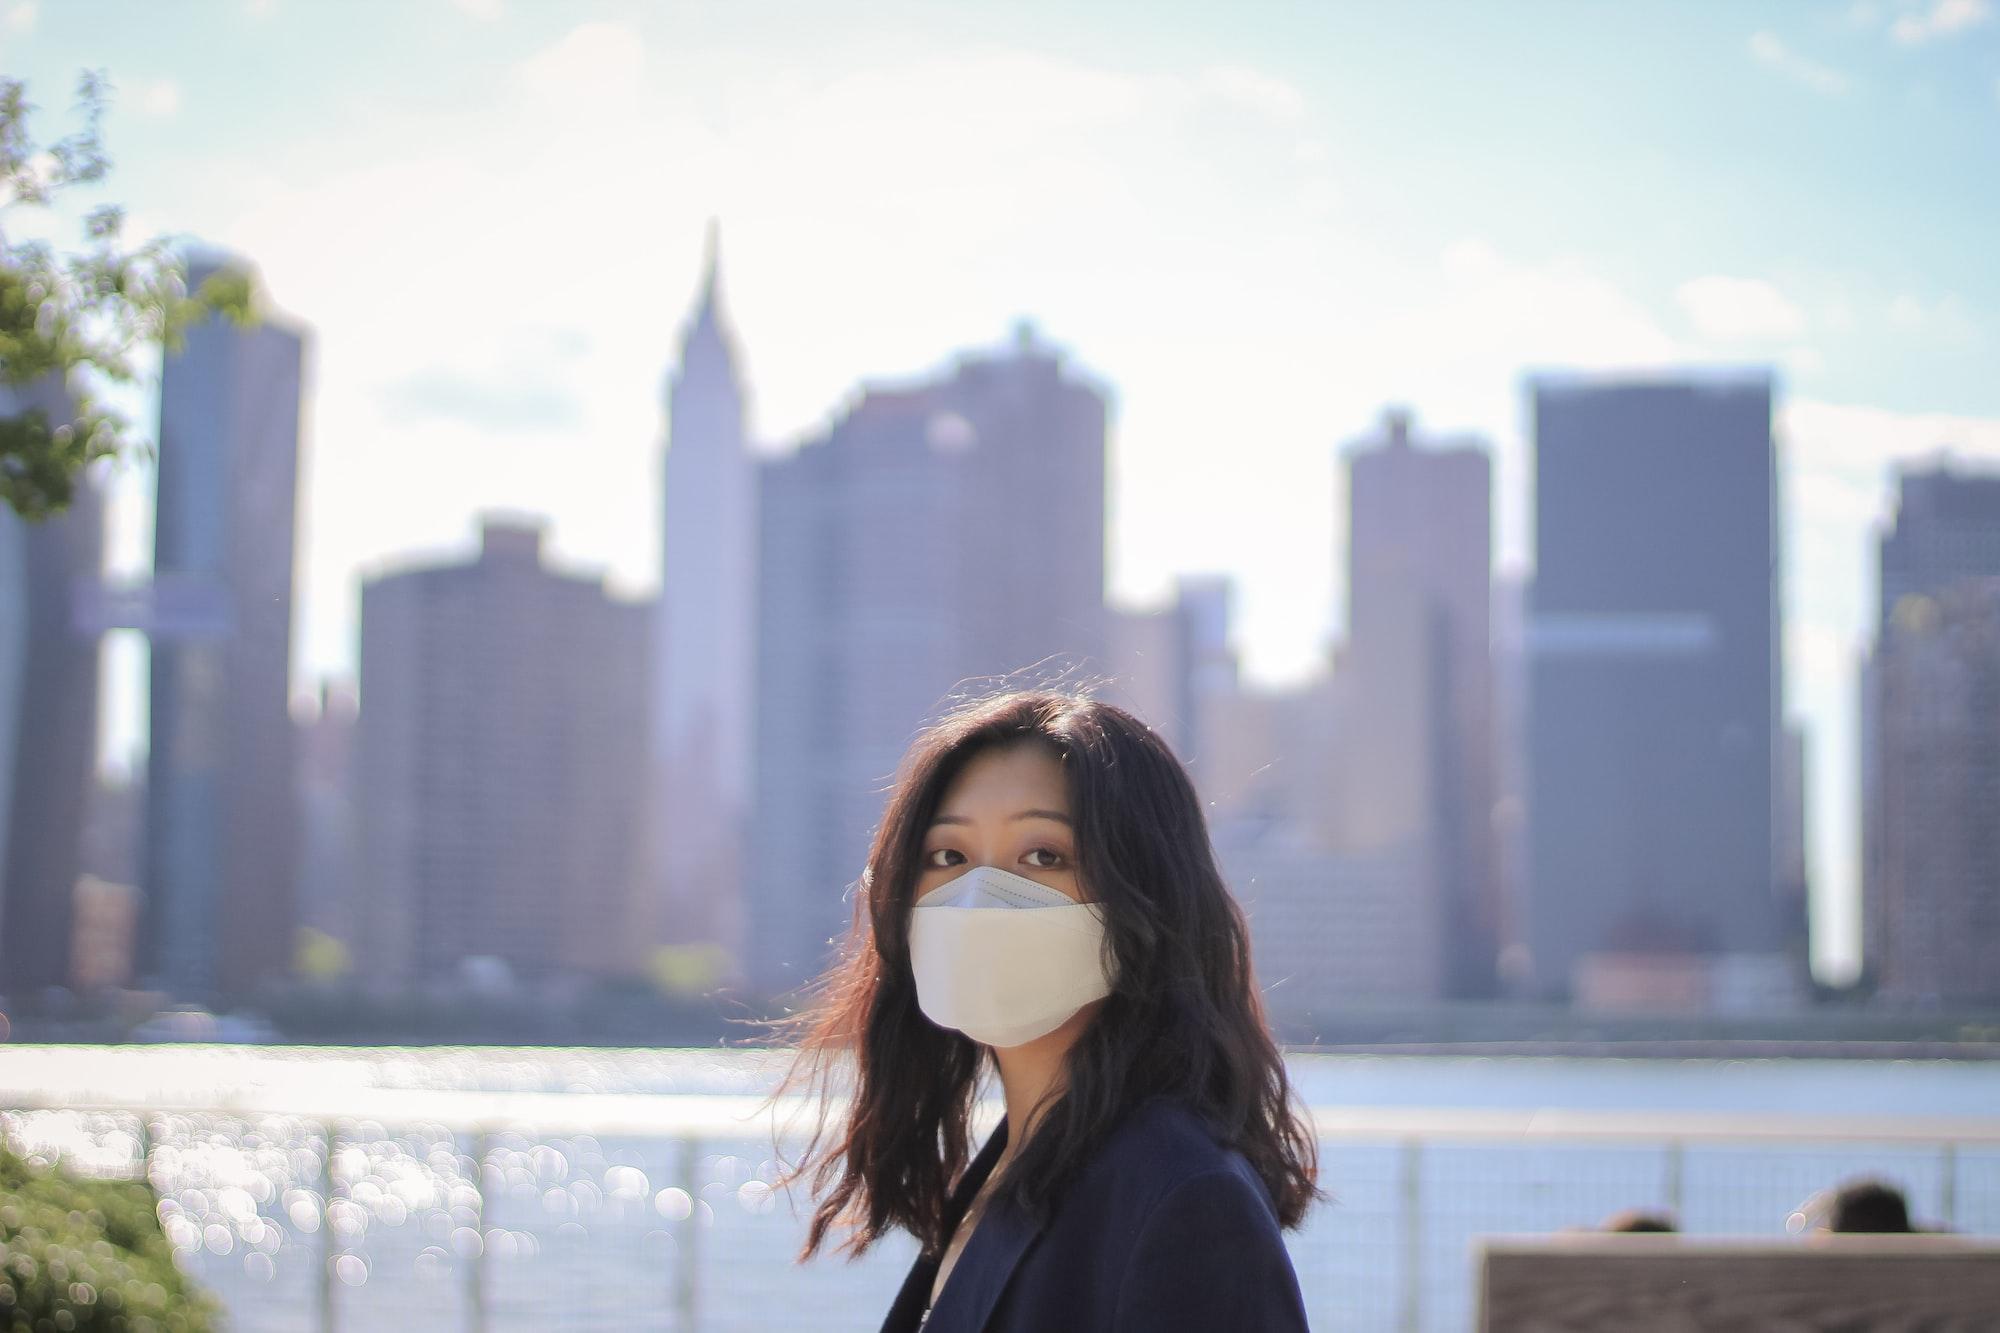 Model IG @esthermjo wearing mask front of NYC skyline